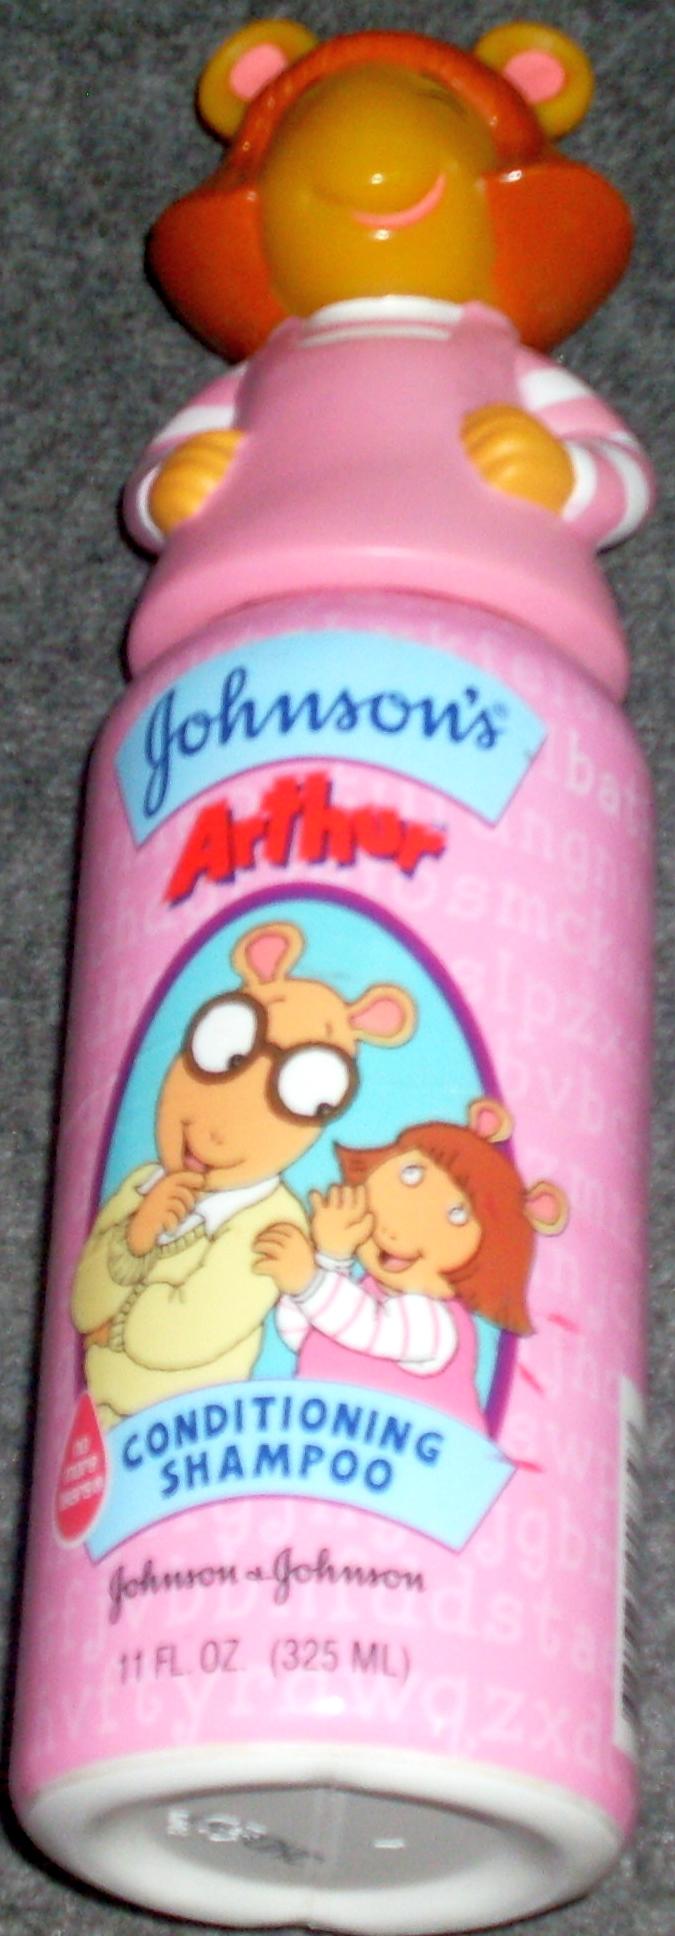 Johnson's Arthur Conditioning Shampoo